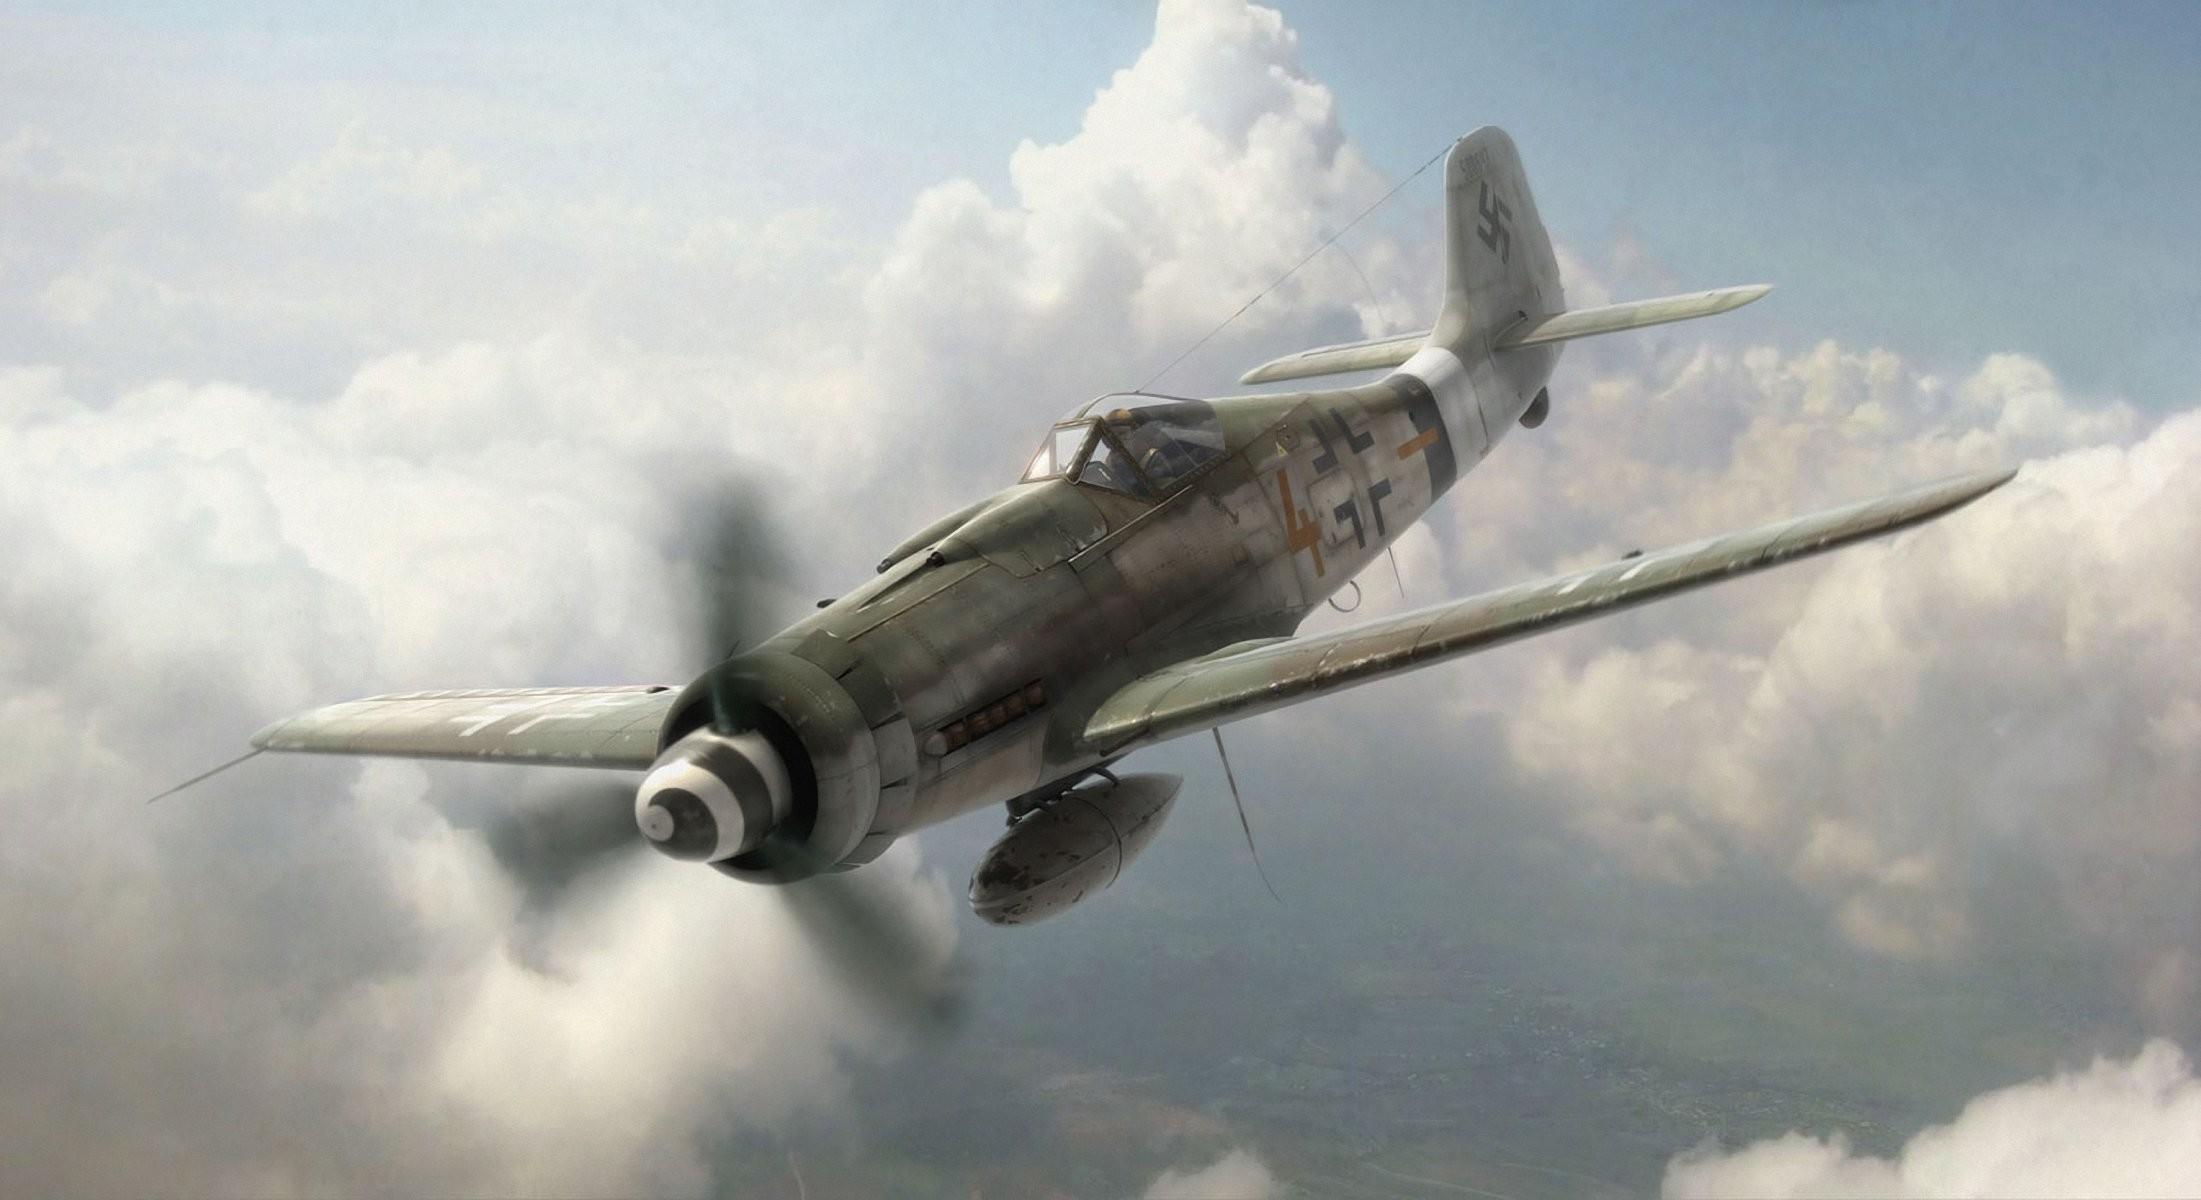 aviation aircraft airplane war dogfight ww2 german aircraft fw 190